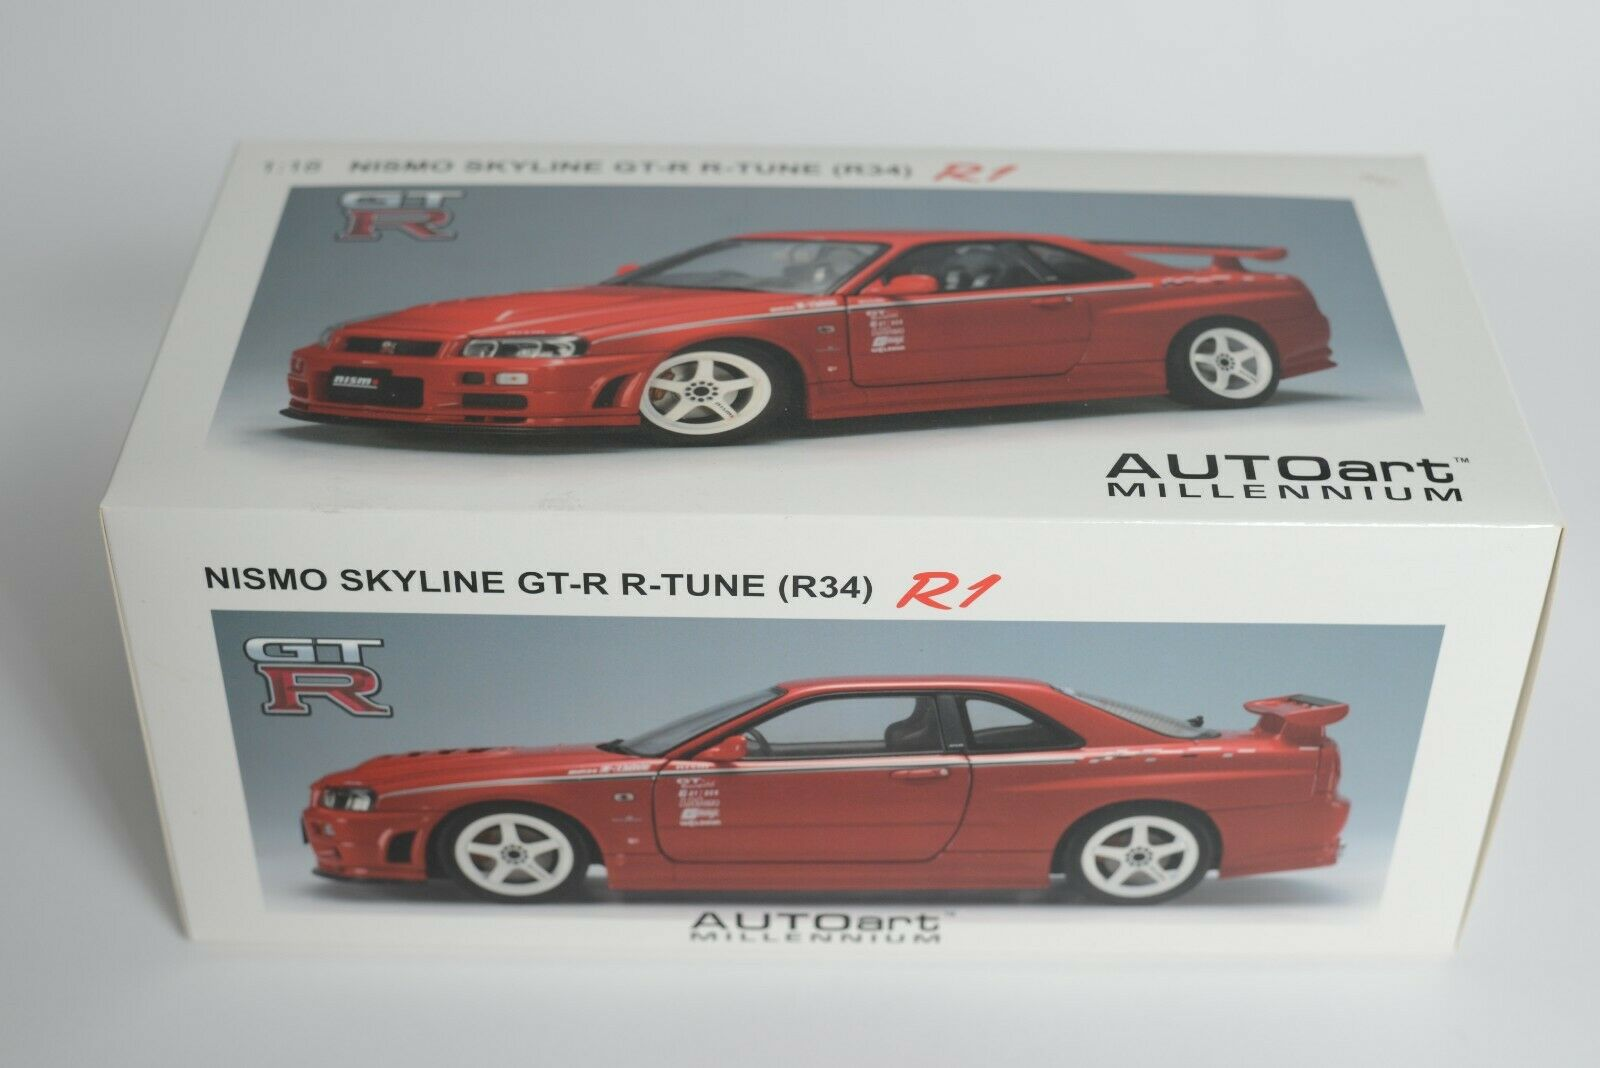 1 18 Nissan Skyline GT-R R34 Nismo R-Tune rosso Diecast Model AUTOart 77357